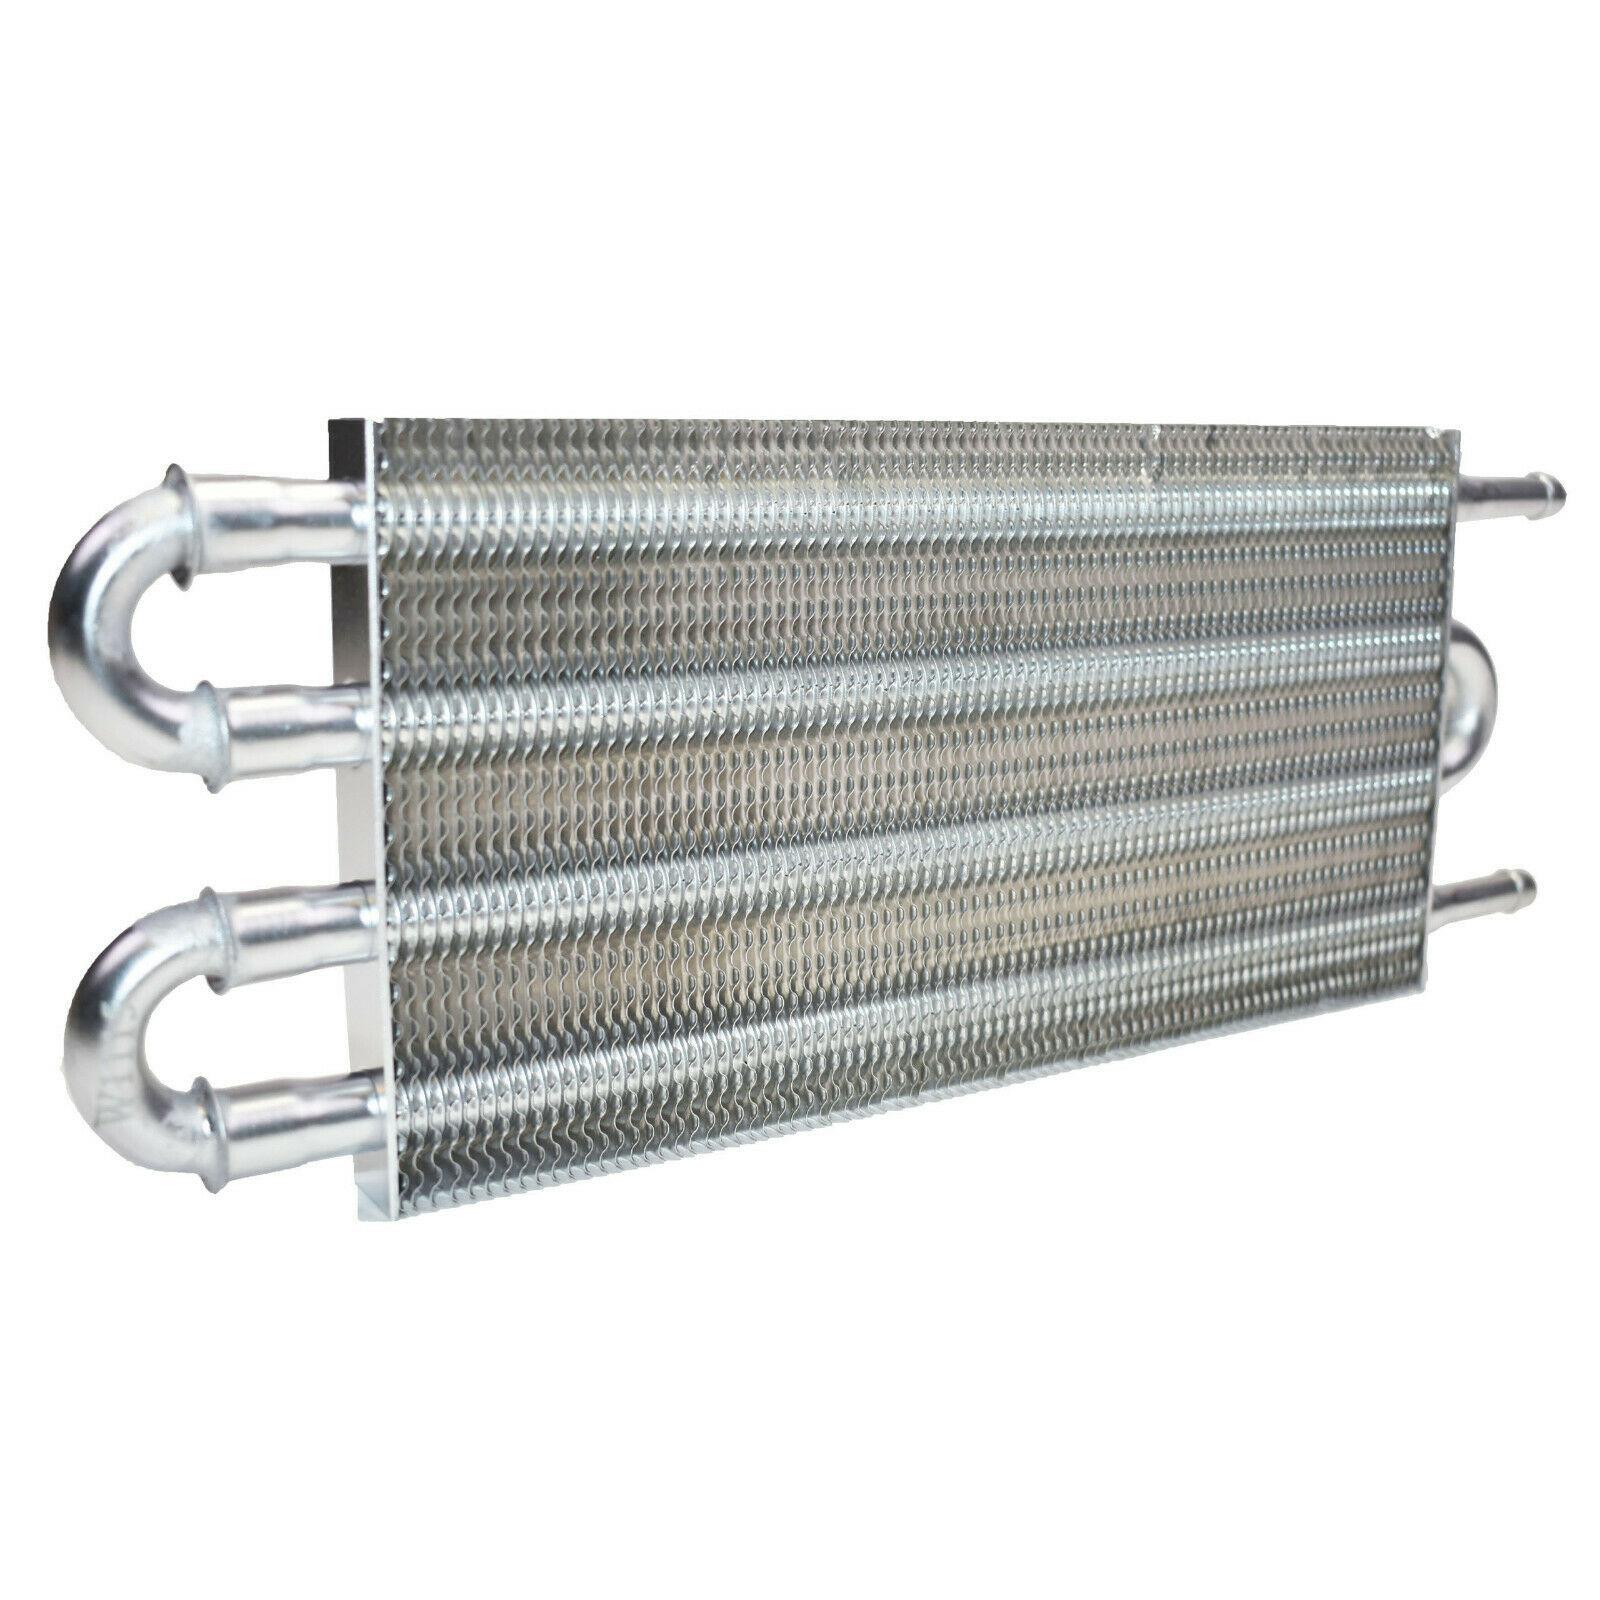 "3/8"" Universal Aluminum Transmission Oil Cooler 12-3/4"" X 5"" X 3/4"""